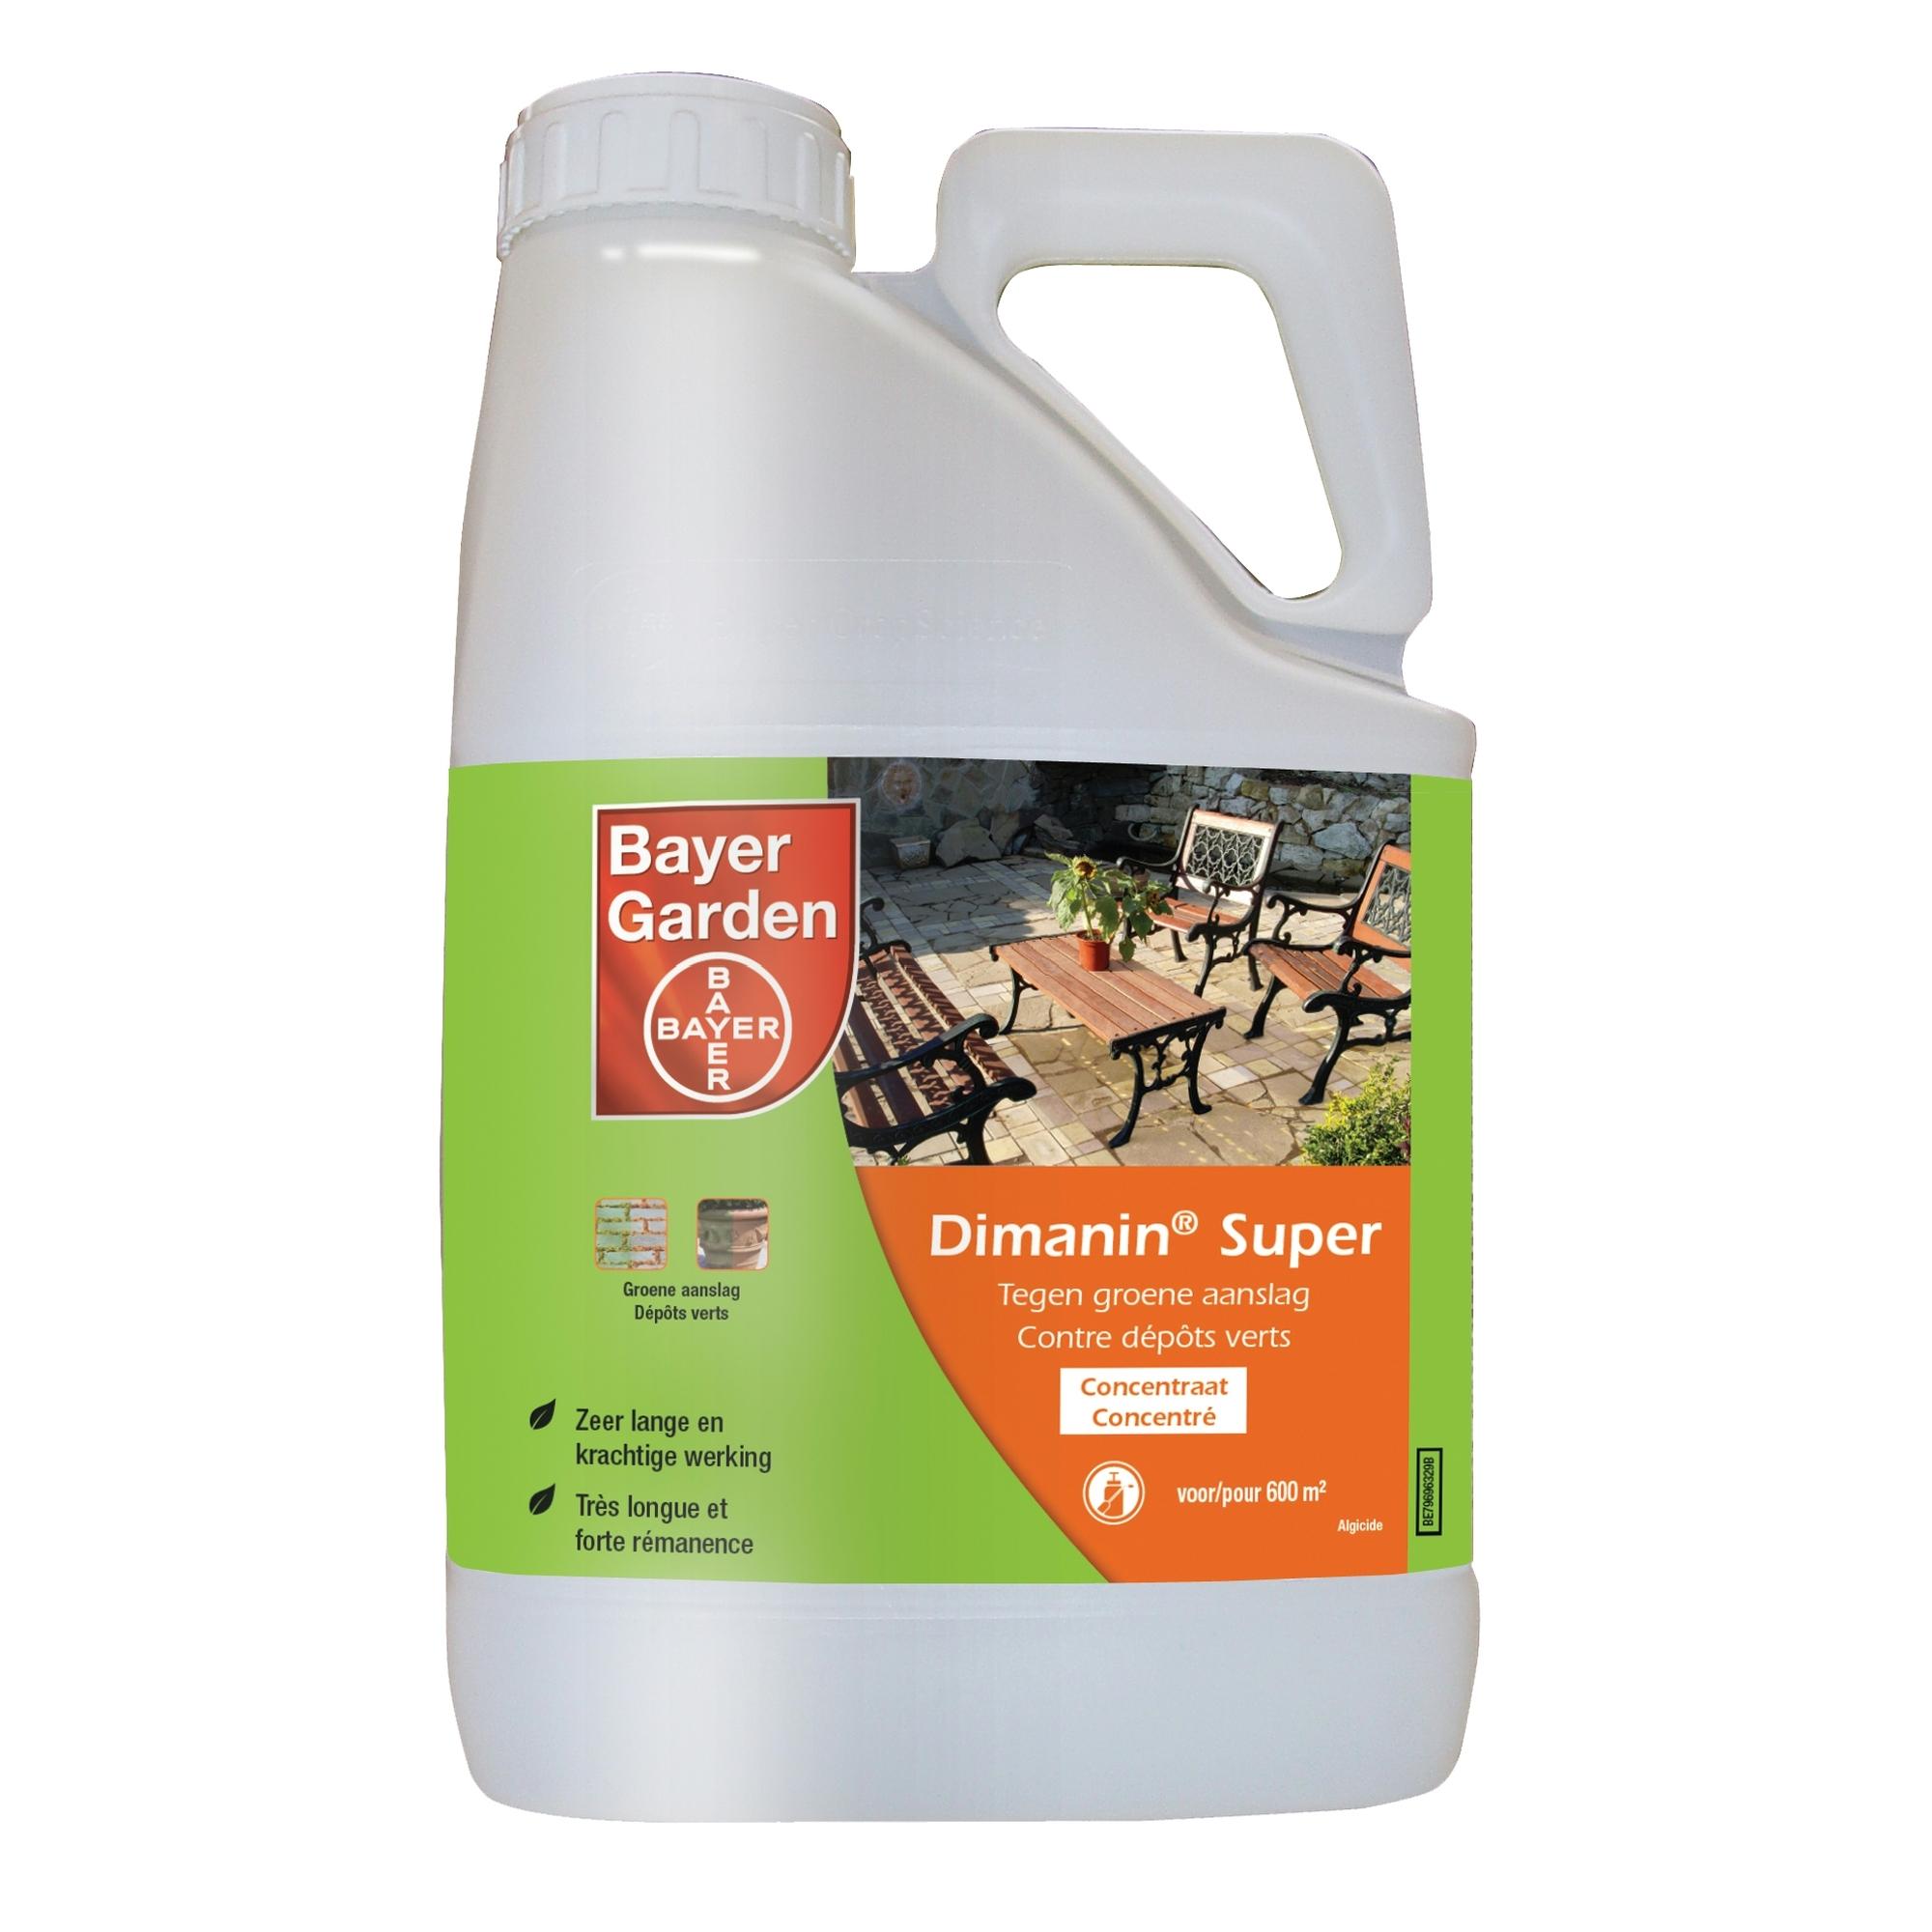 Bayer dimanin anti algues anti mousses 5l desherbants for Bayer jardin anti mousse